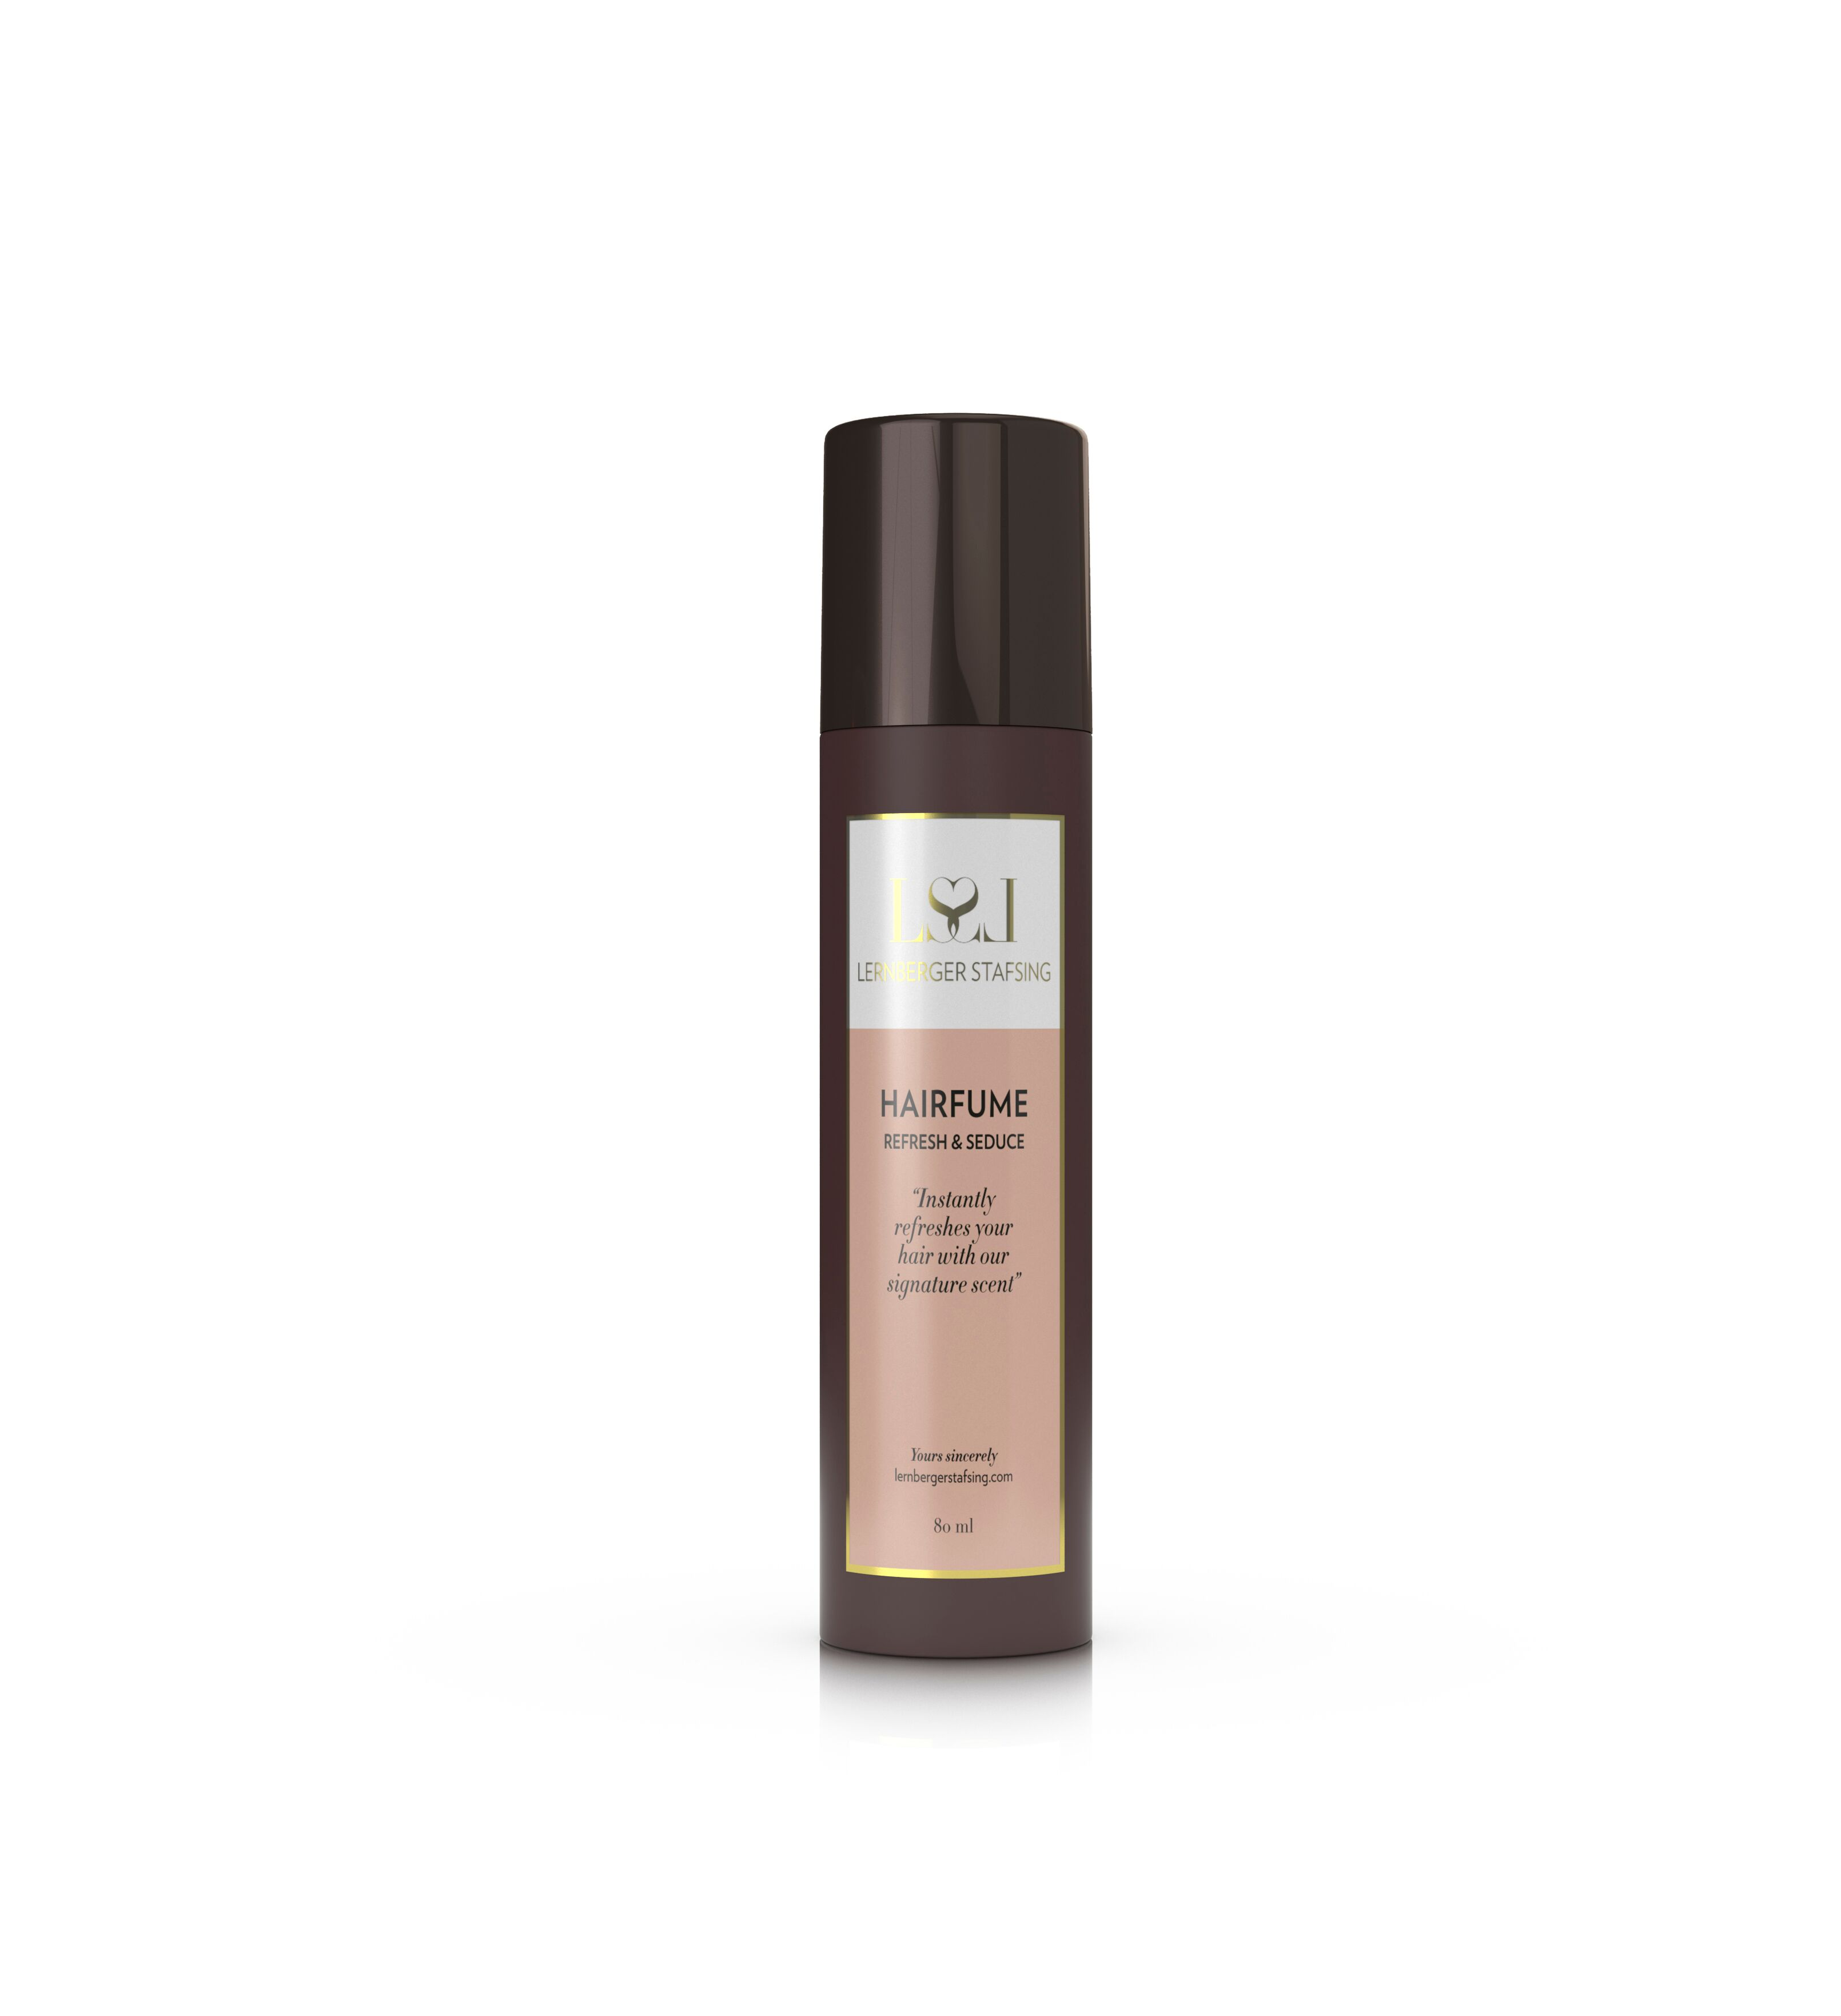 Lernberger Stafsing Hairfume Travel Size, 80 ml